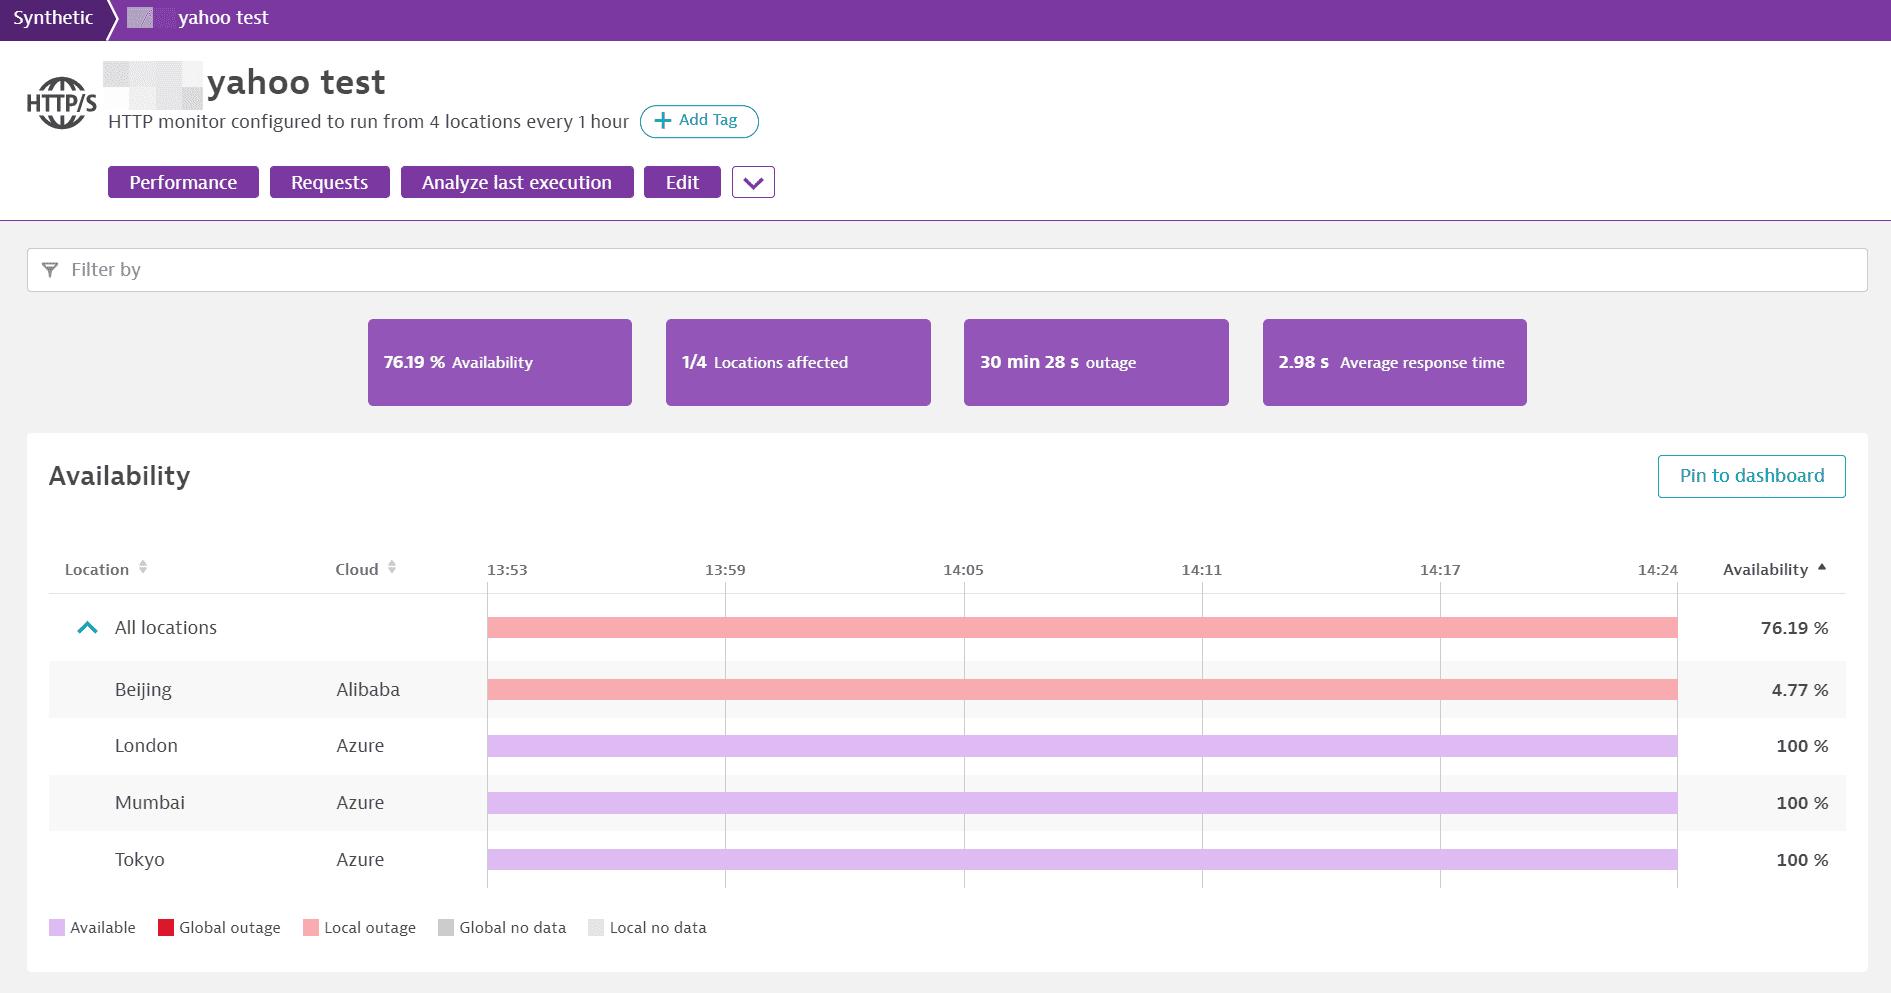 HTTP monitor availability